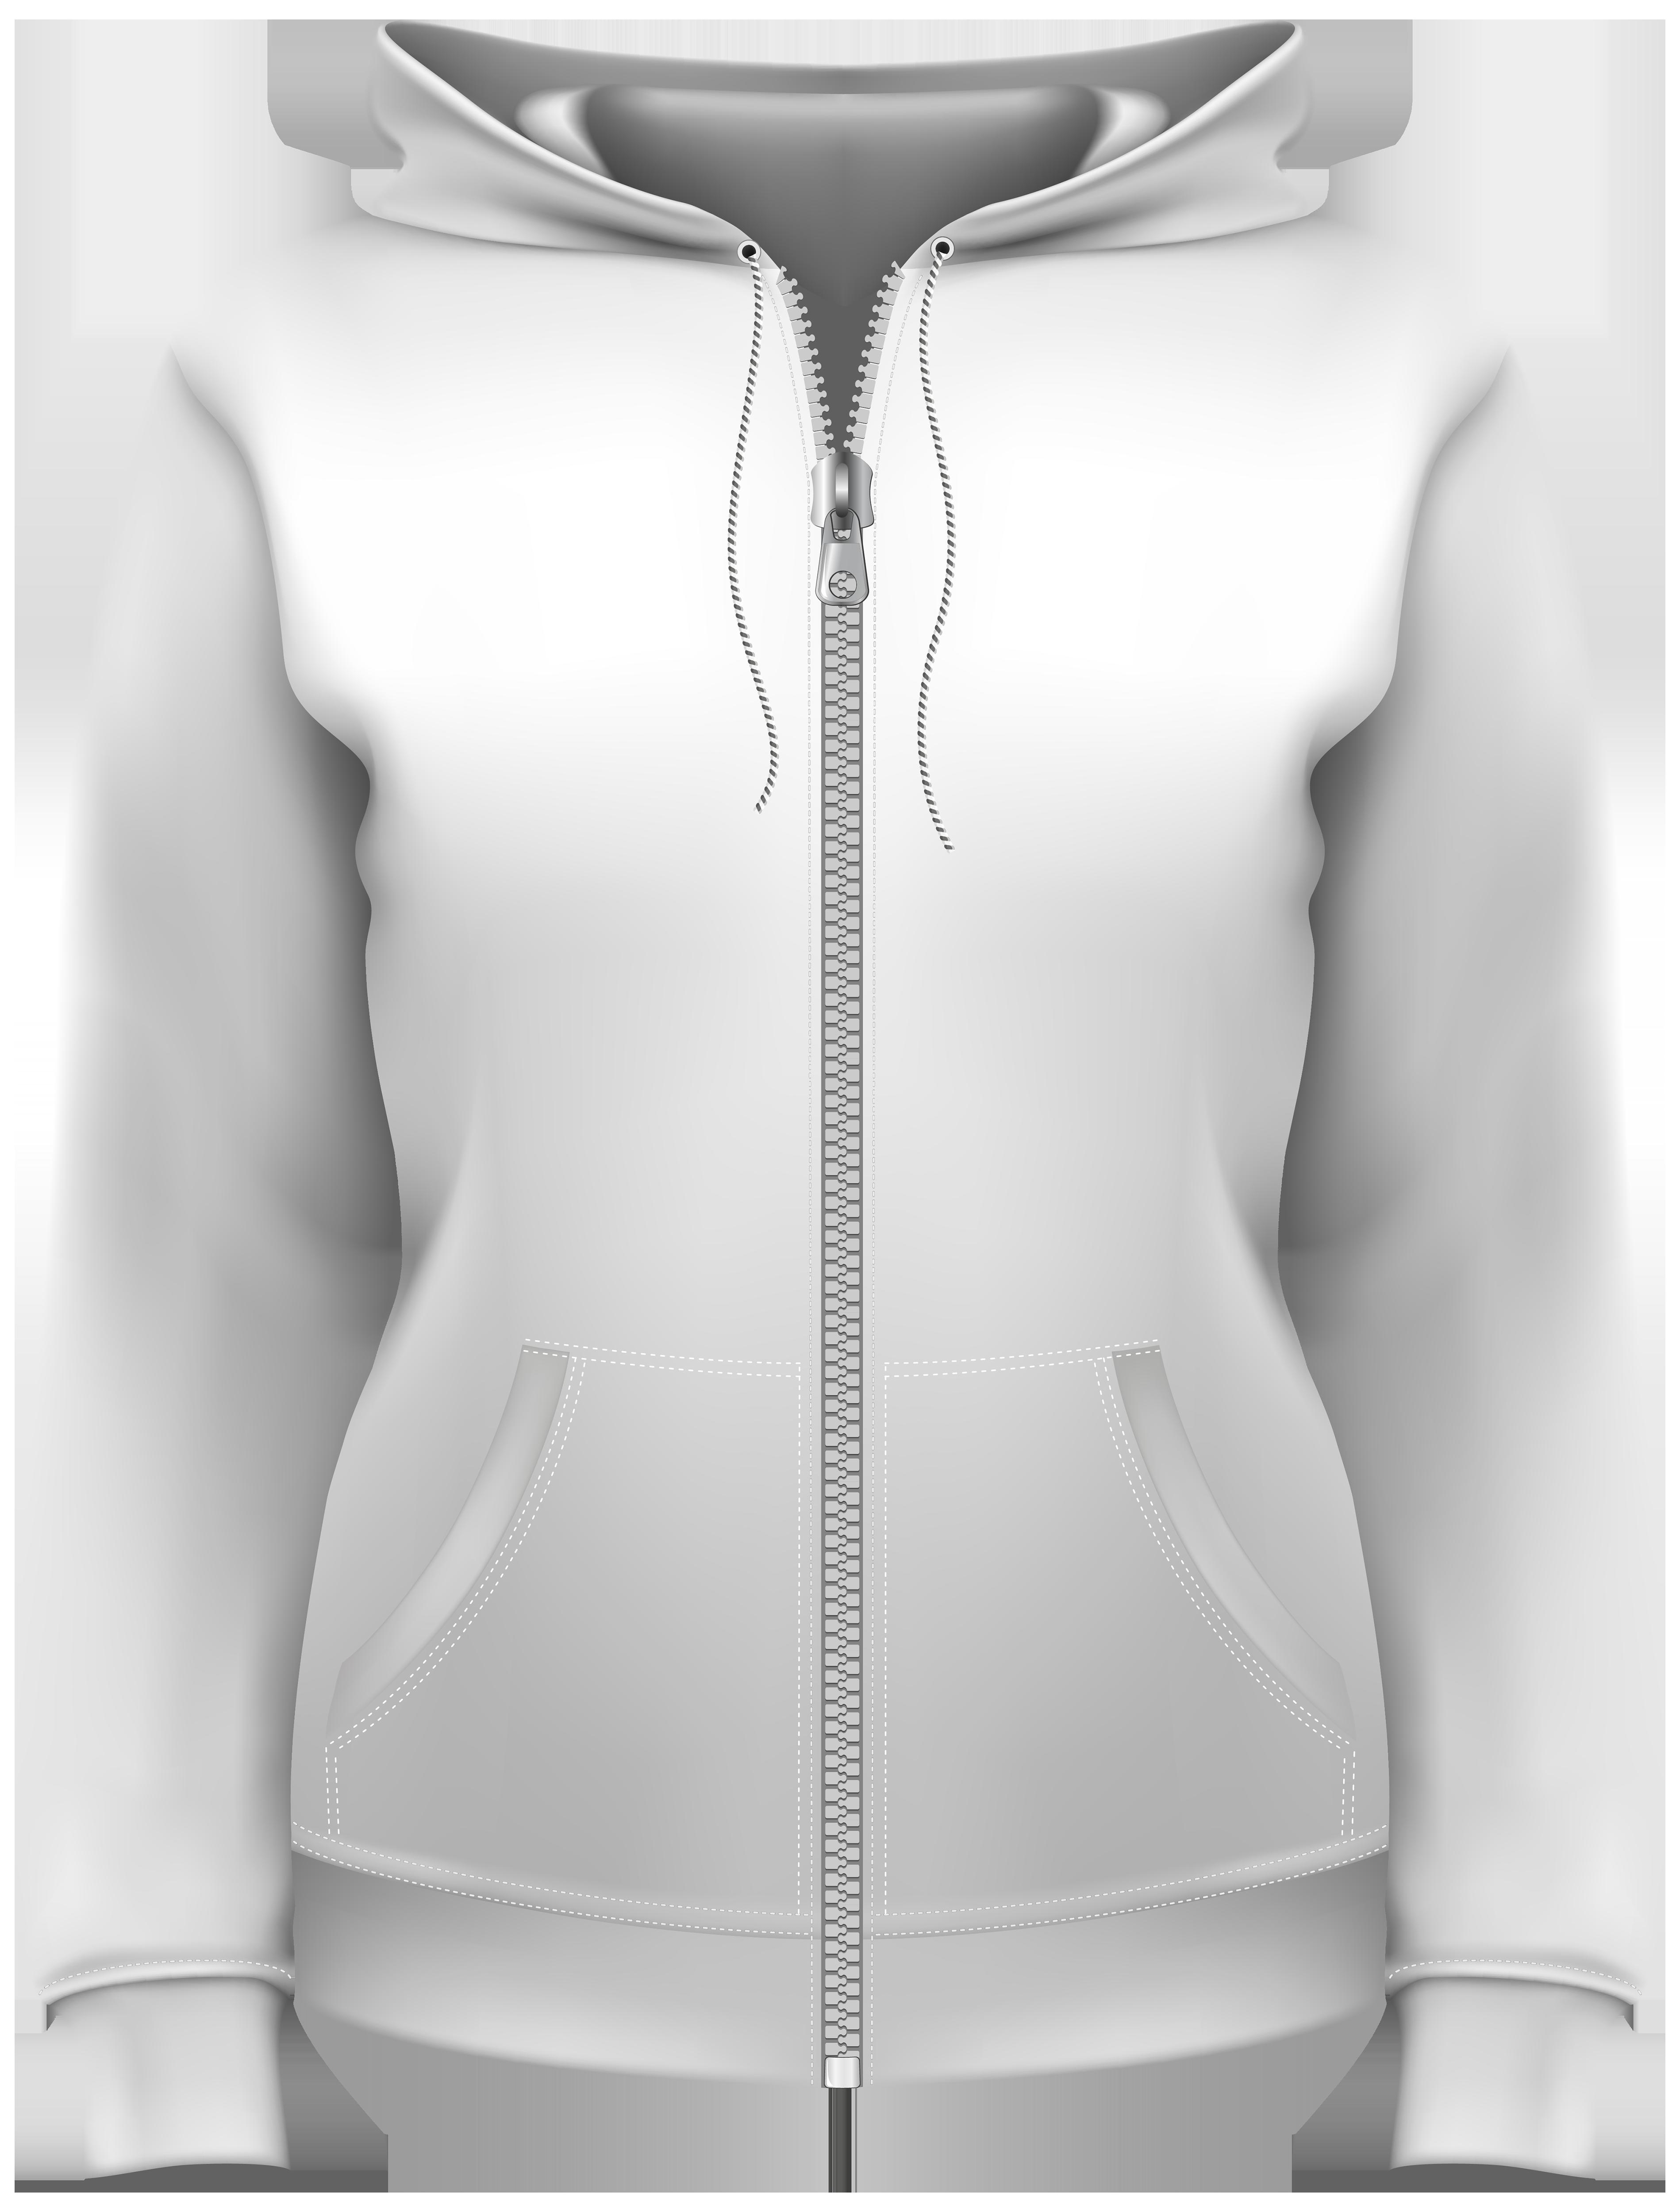 Jacket clipart zipper clipart, Jacket zipper Transparent.